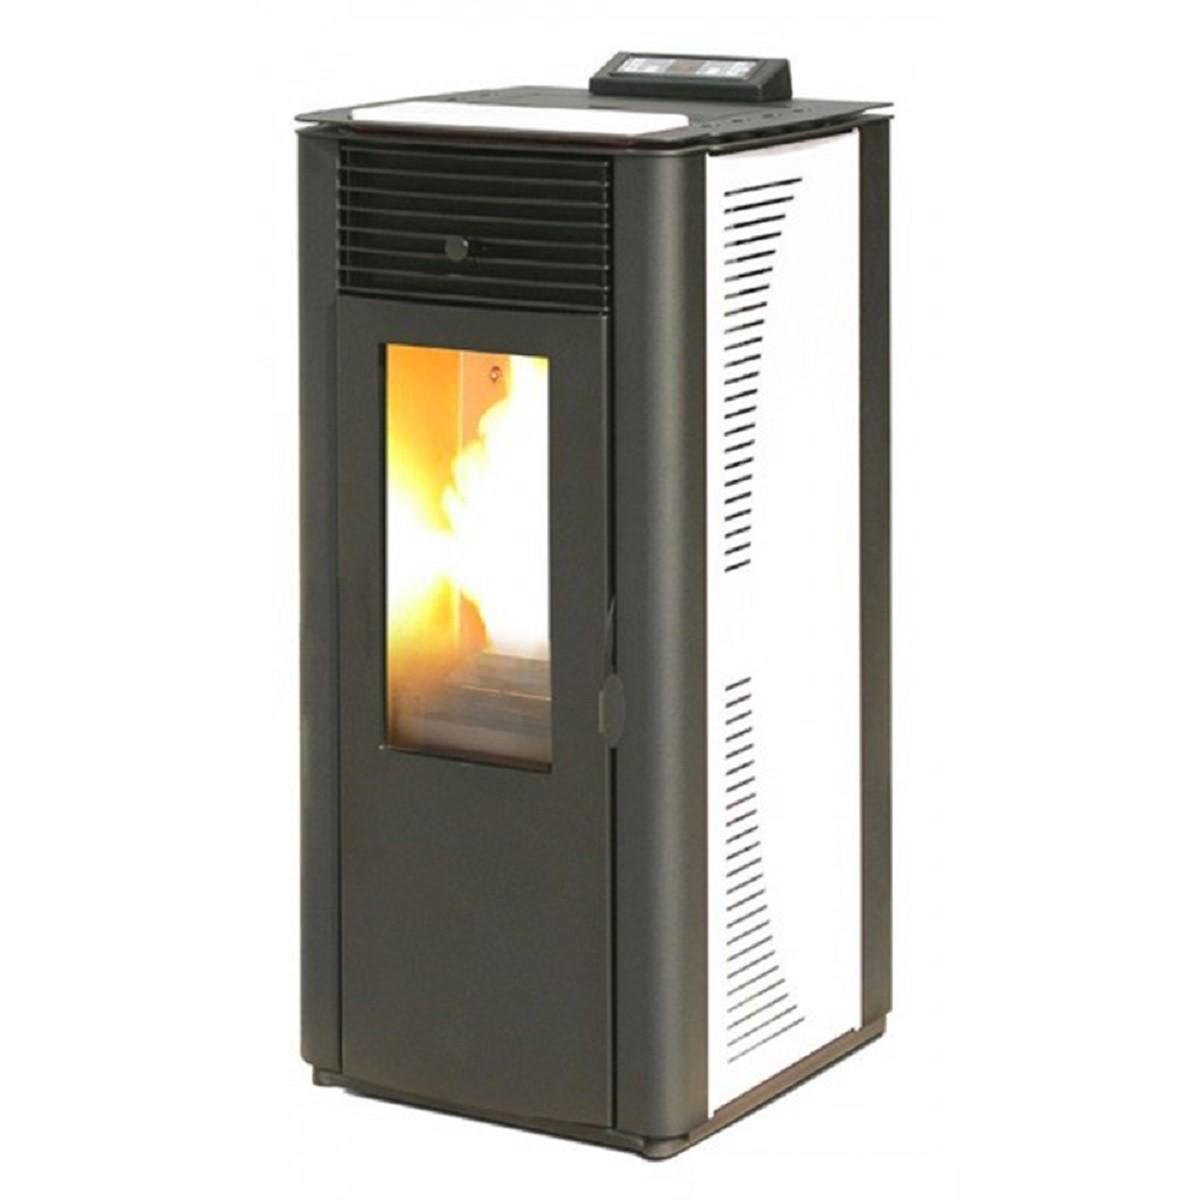 Termostufa a pellet king idro 20 kw bianca con telecomando for Radiatori a gas argo